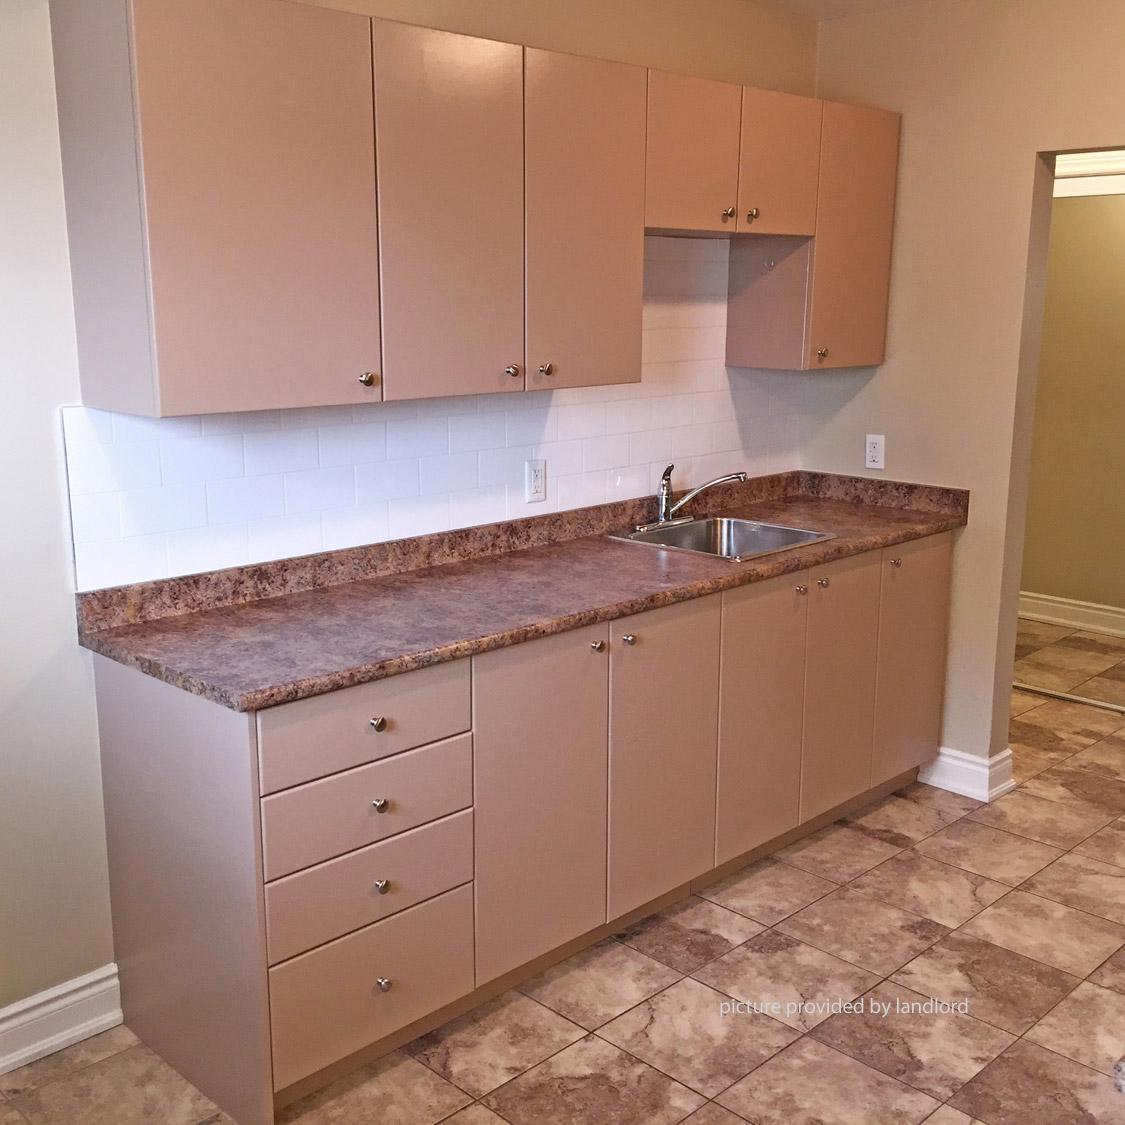 359 Elgin Crt, OSHAWA , ON : 2 Bedroom For Rent -- OSHAWA